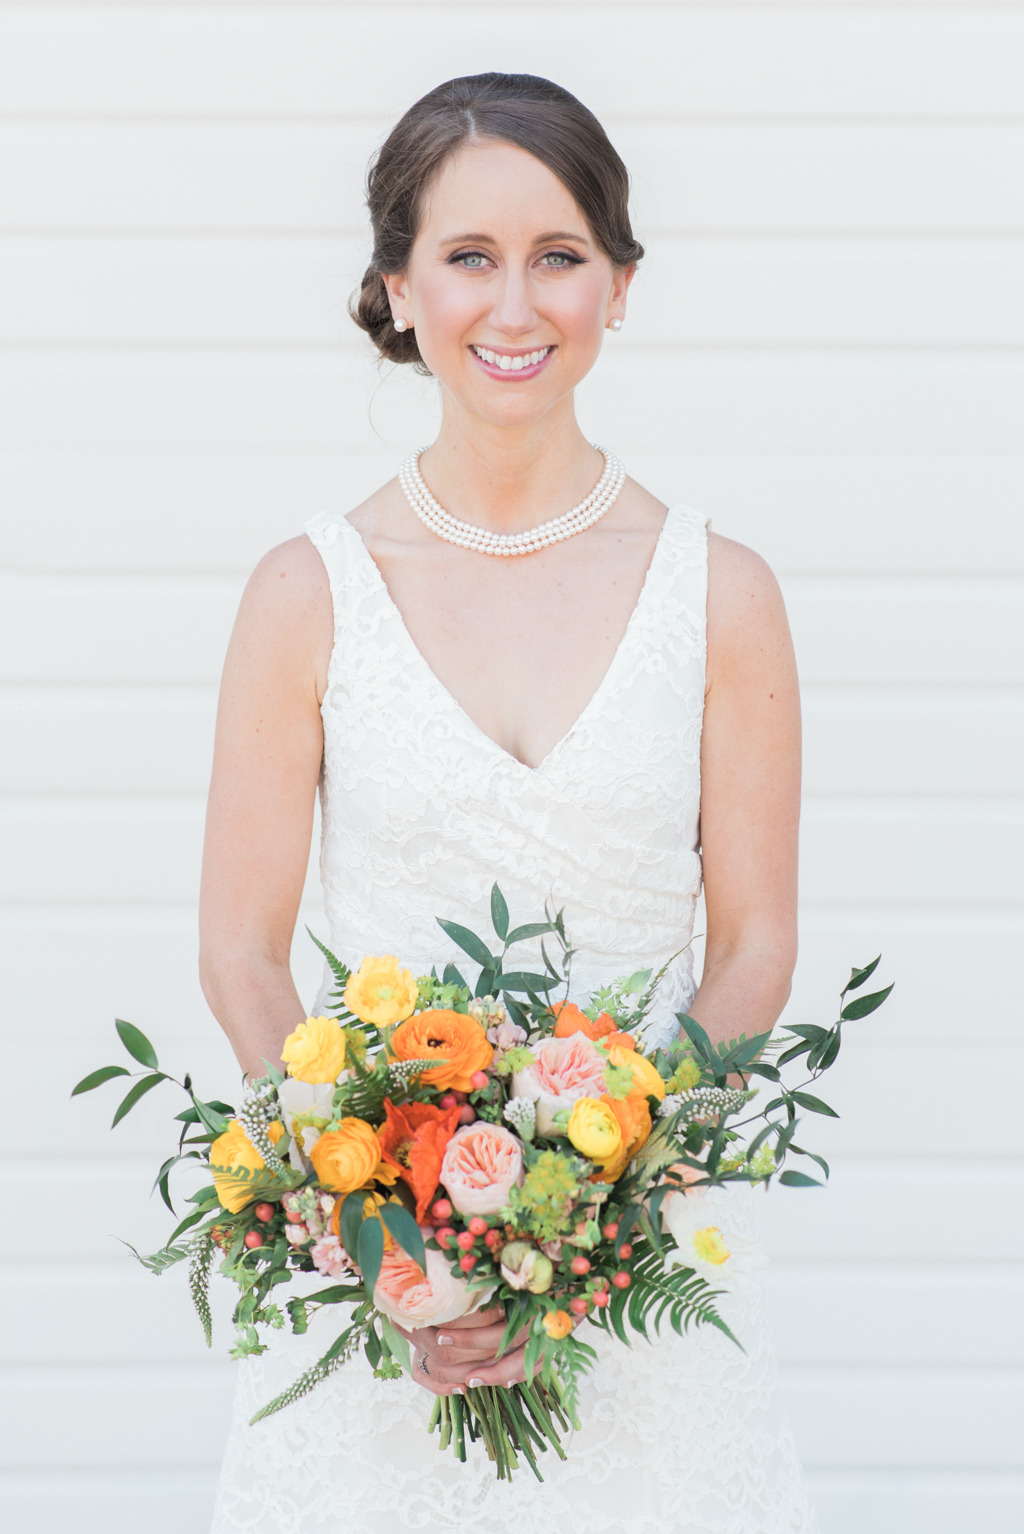 Modern_Coopers_Hall_ Wedding__Lauryn_Kay_Photography-10-13